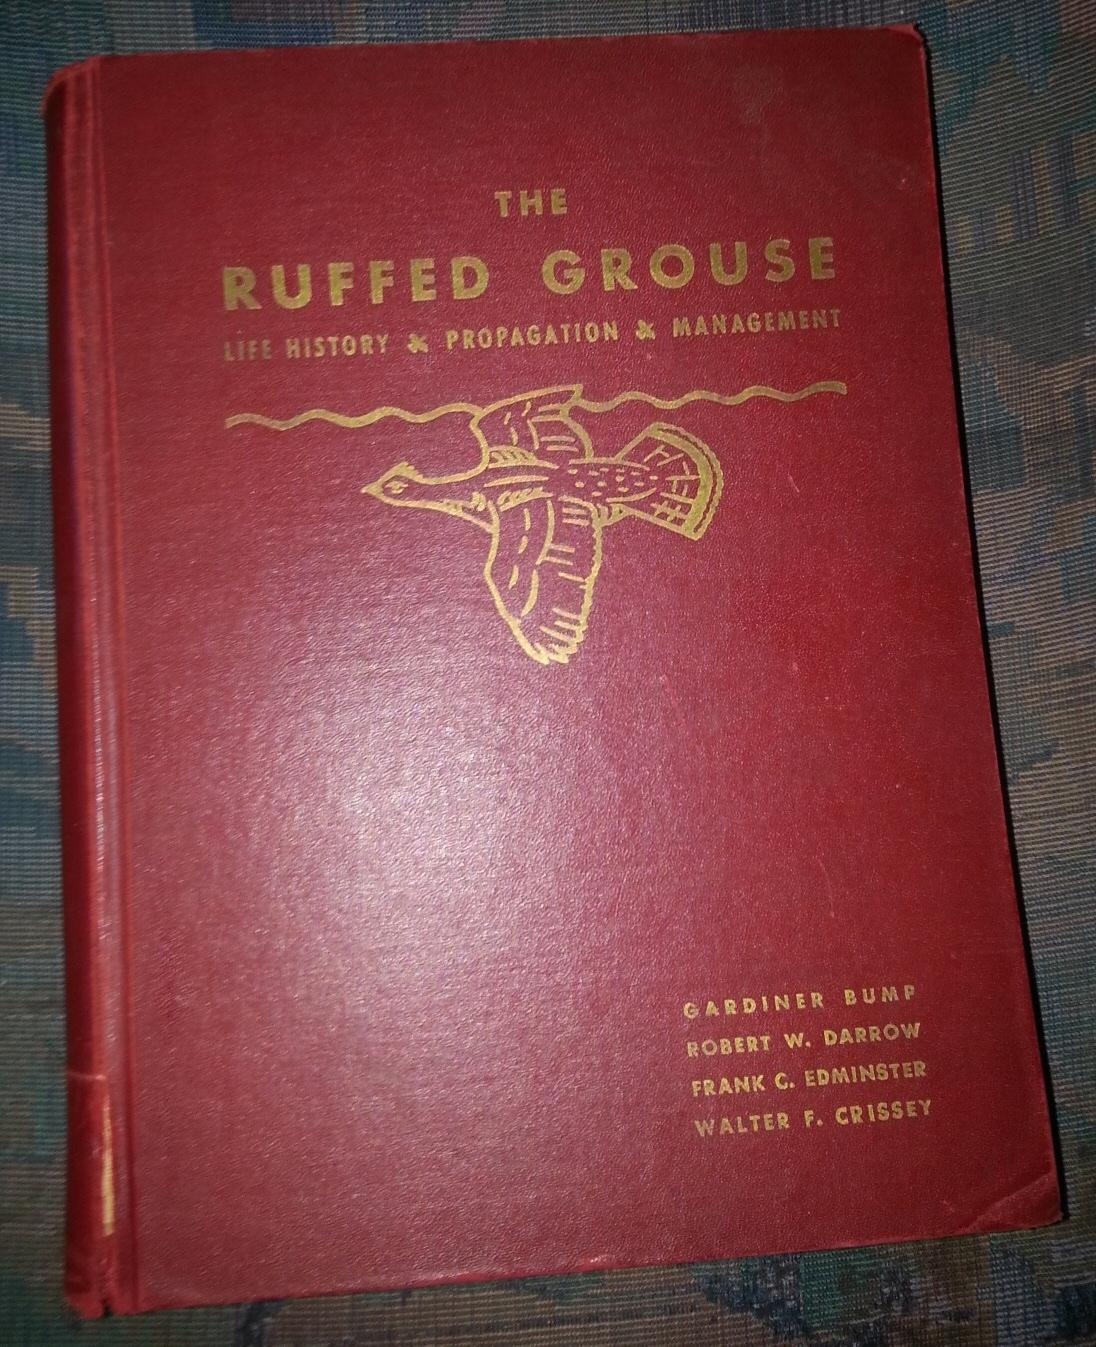 The Ruffed Grouse: Life History, Propagation, Management, Bump, Gardiner and  Robert W. Darrow; Frank C. Edminster; Walter F. Crissey